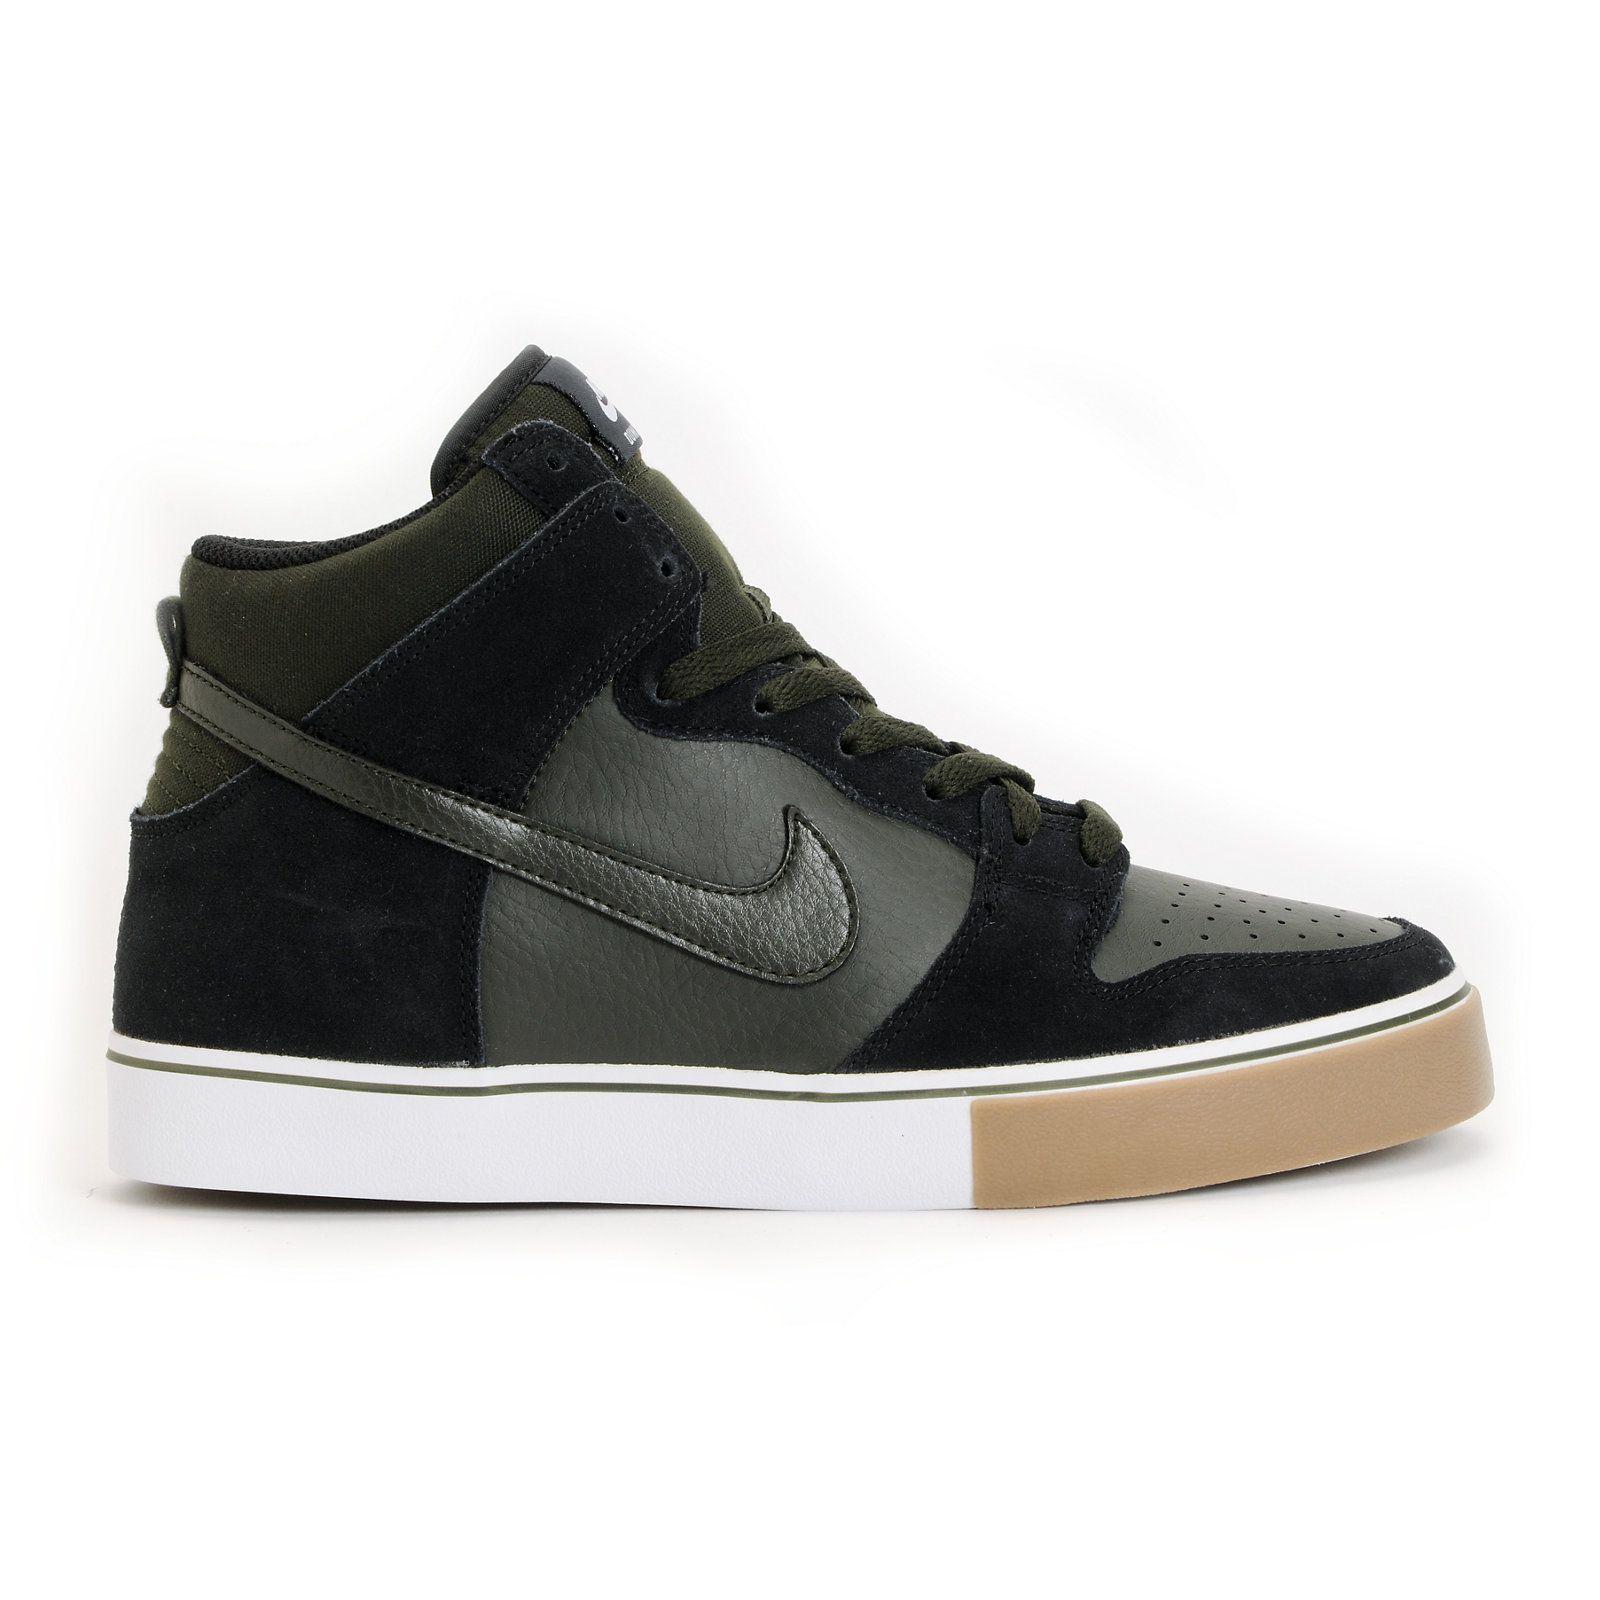 ... Nike SB Dunk High LR Black, Sequoia, Gum Medium Brown White Shoe at .